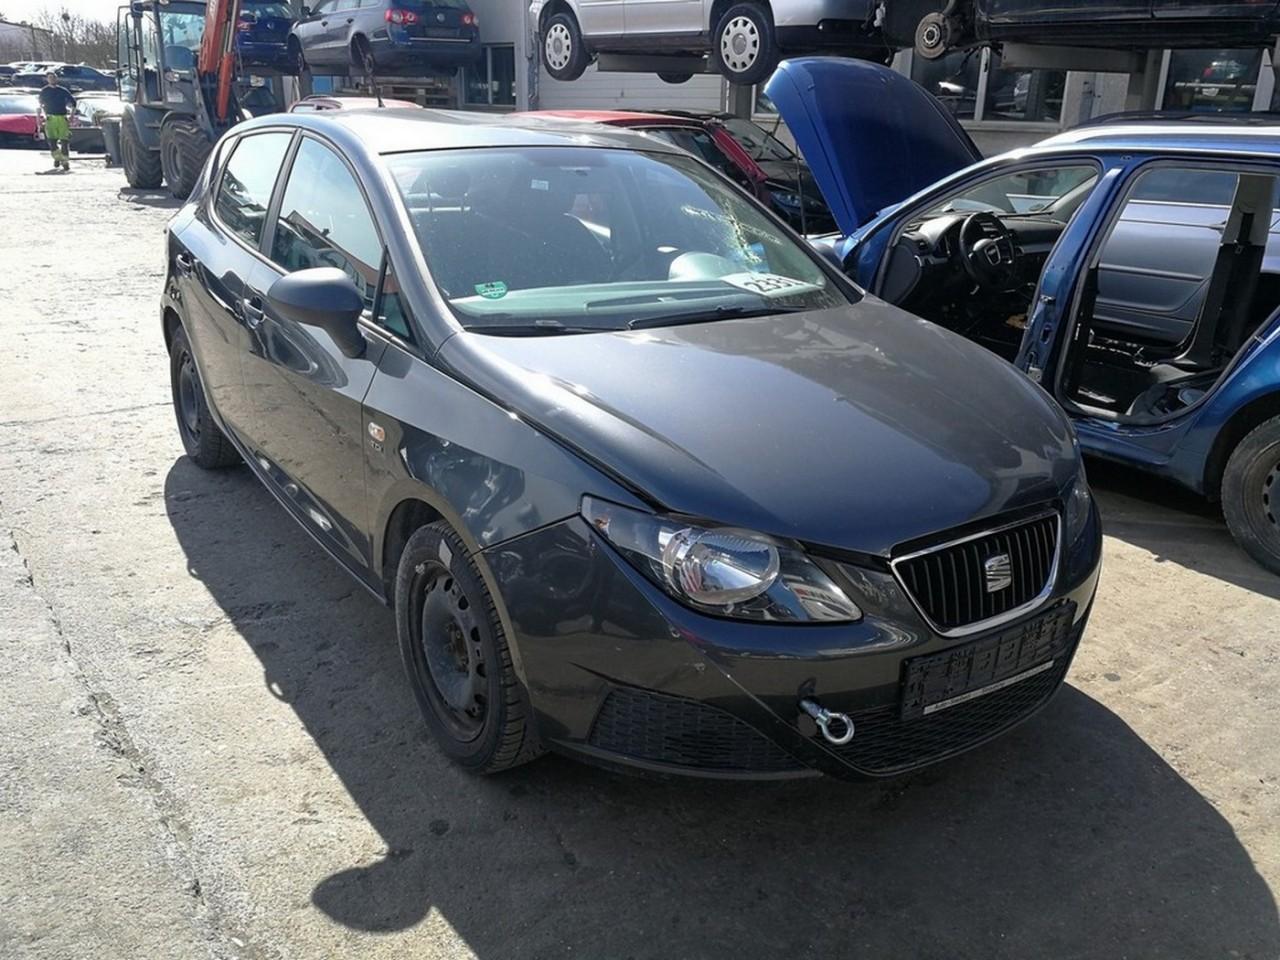 DEZMEMBRARI AUTO / DEZMEMBREZ Seat Ibiza 6J an 2009 - 2010 - 2011 motor 1.9tdi BLS , 1.4tdi BMS